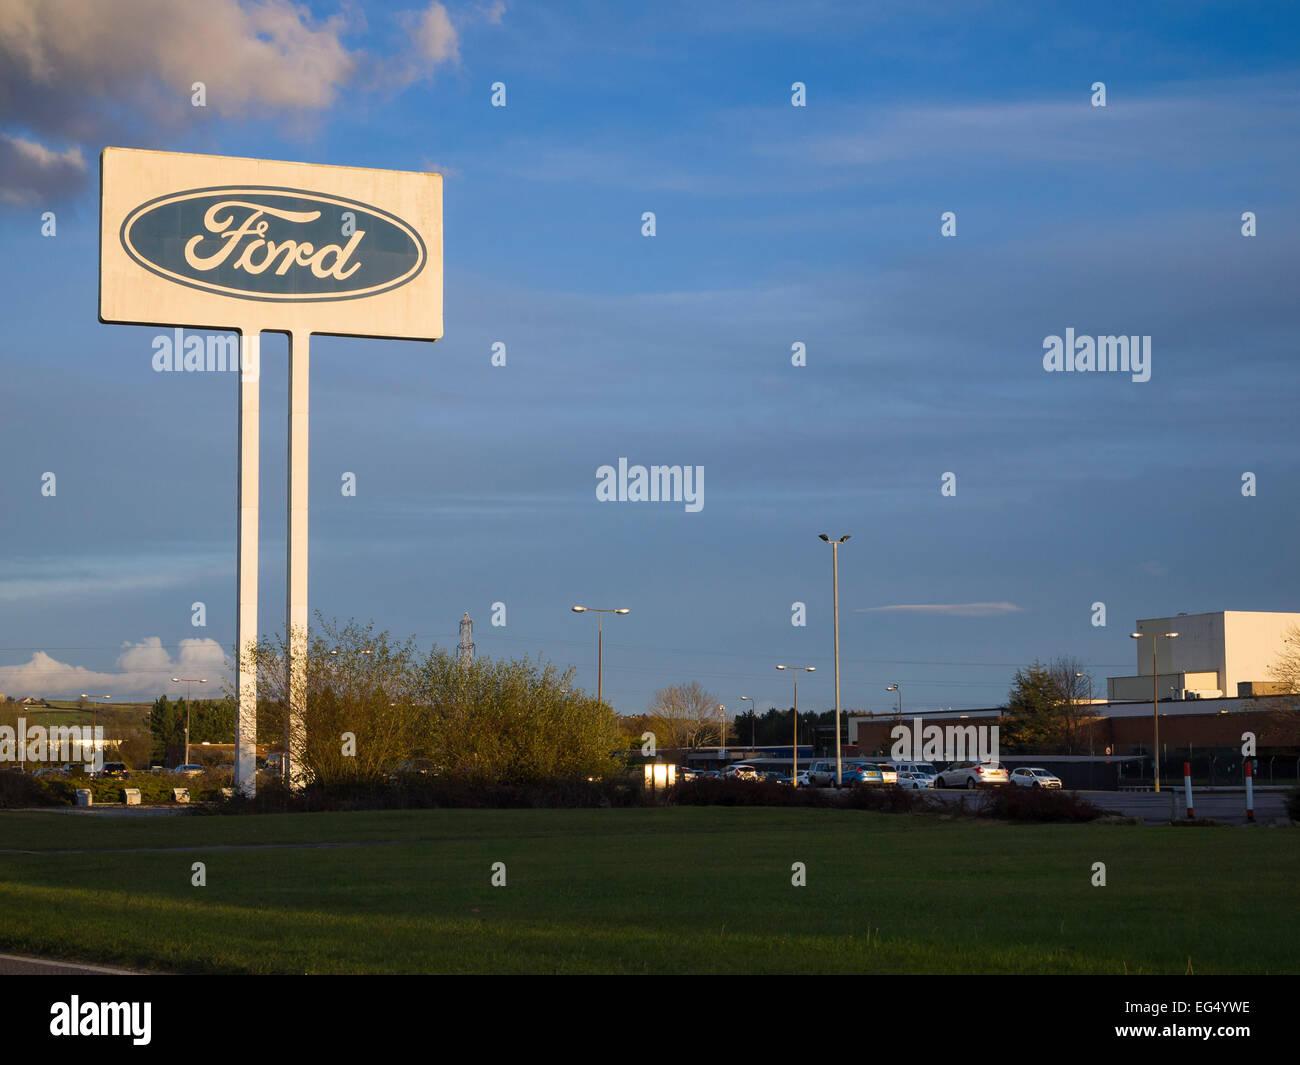 Ford motor Company Zeichen Stockbild